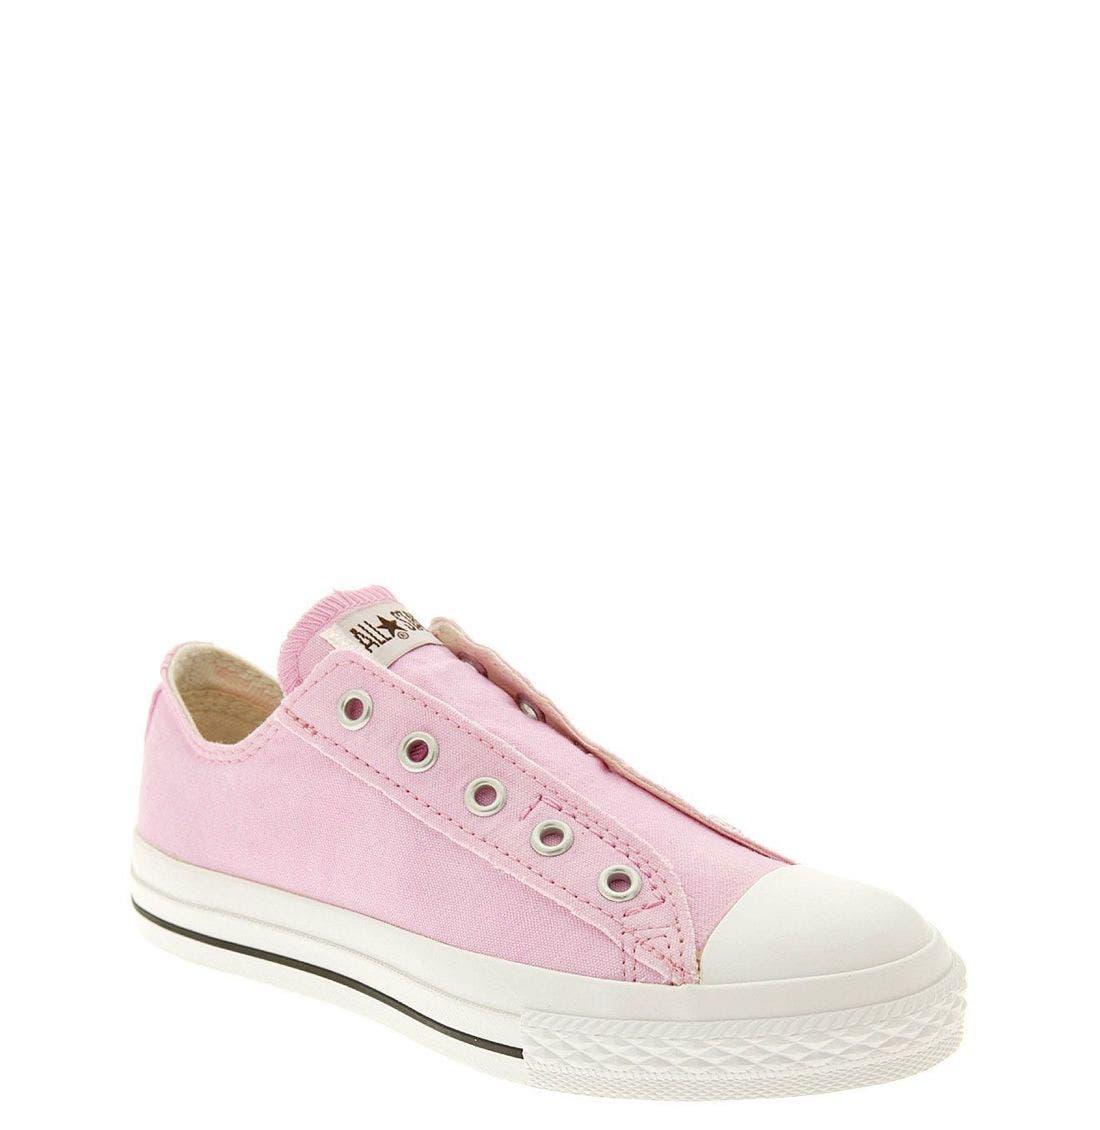 Alternate Image 1 Selected - Converse Chuck Taylor® Slip-On Sneaker (Big Kid)